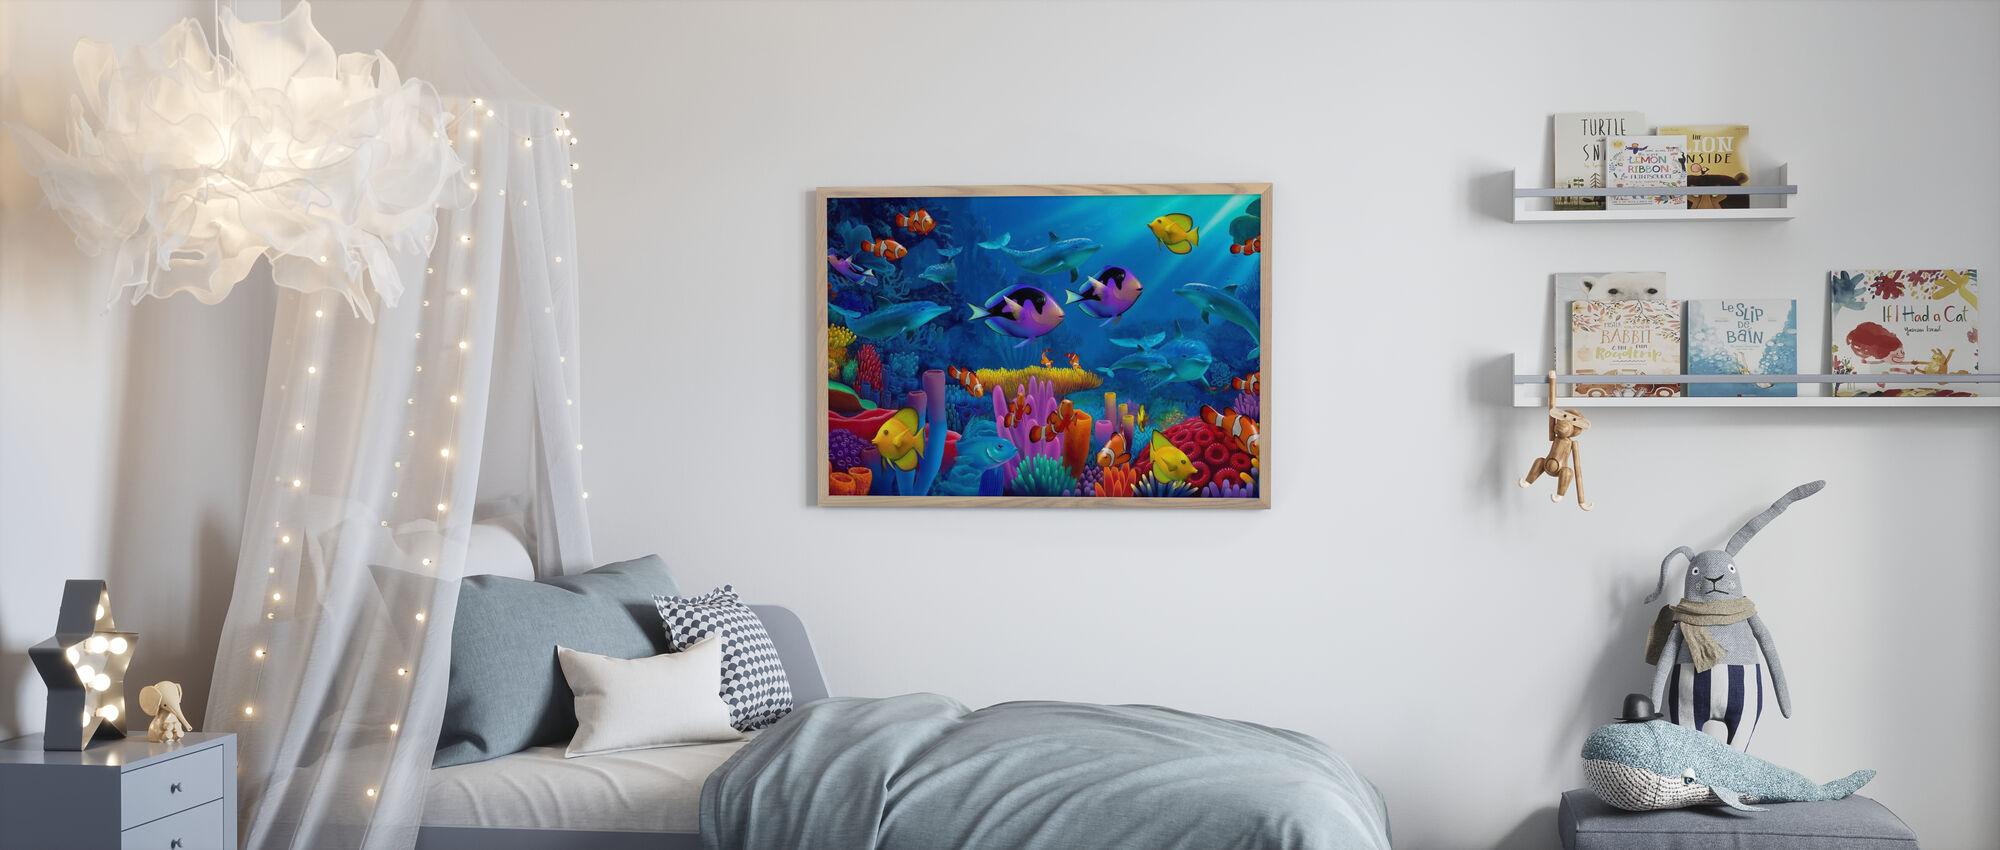 Oceaan van kleur - Ingelijste print - Kinderkamer